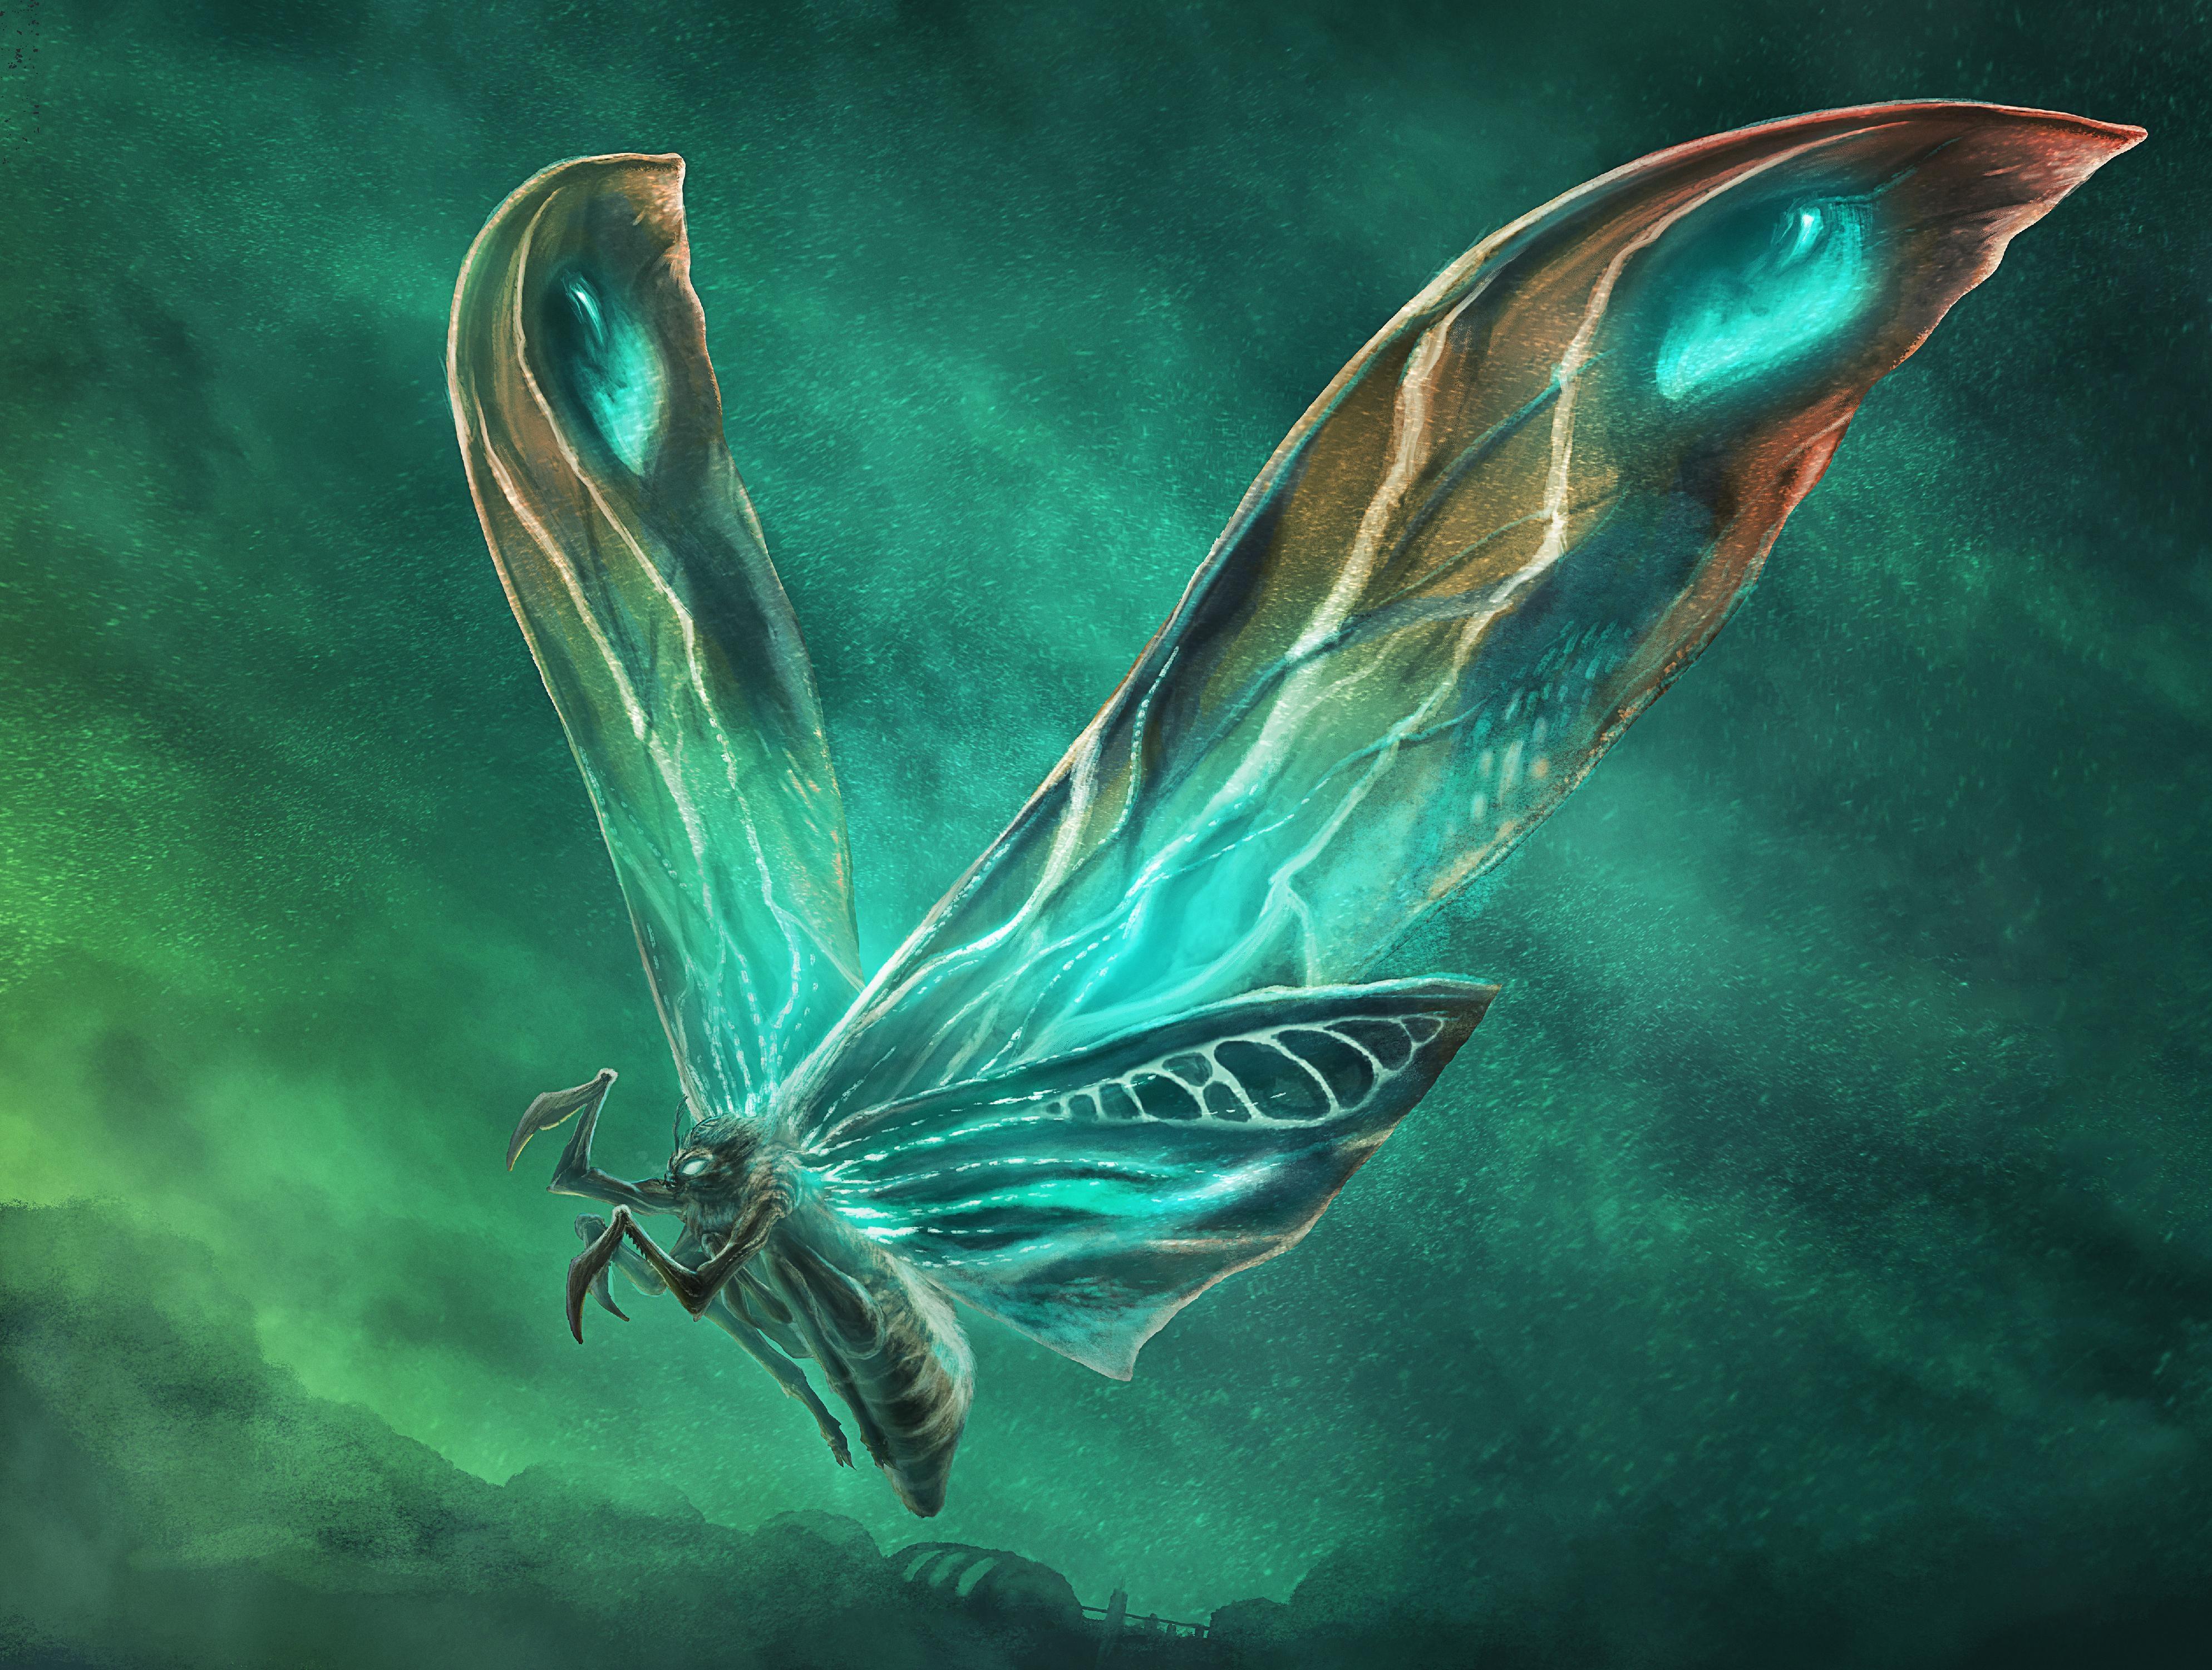 Mothra In Godzilla King Of The Monsters Wallpaper Hd Movies 4k